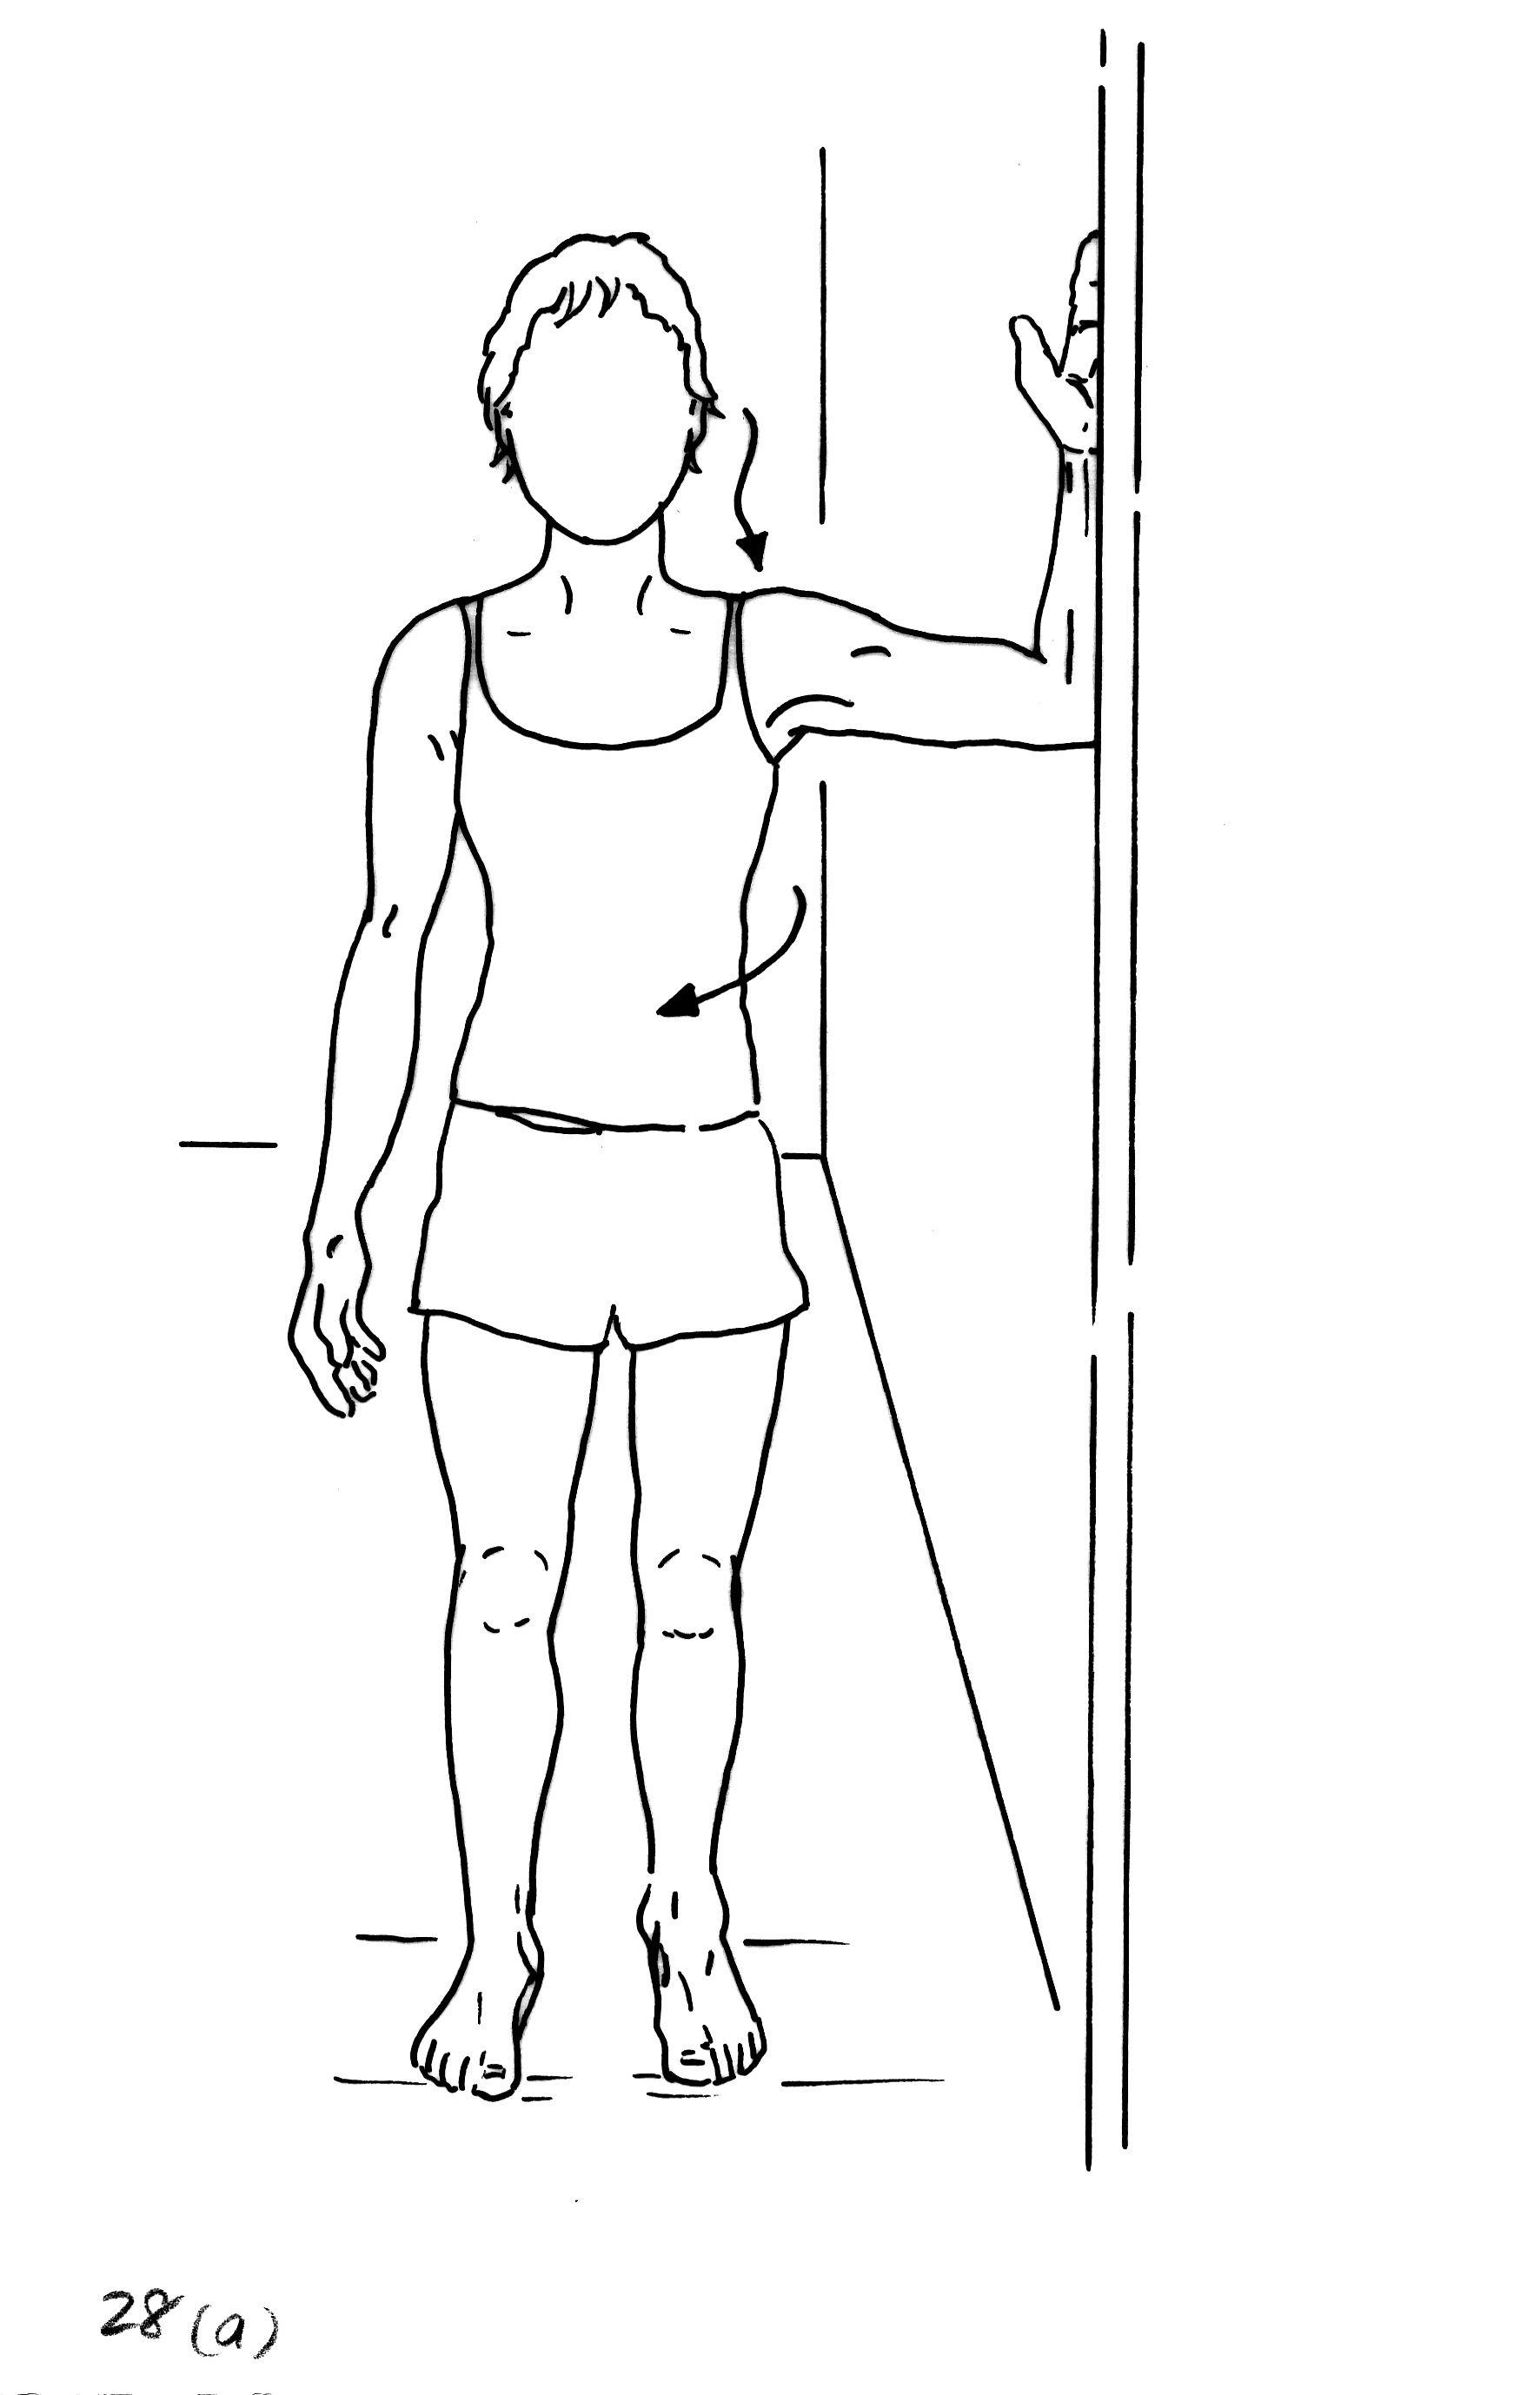 Image Result For Pec Stretch